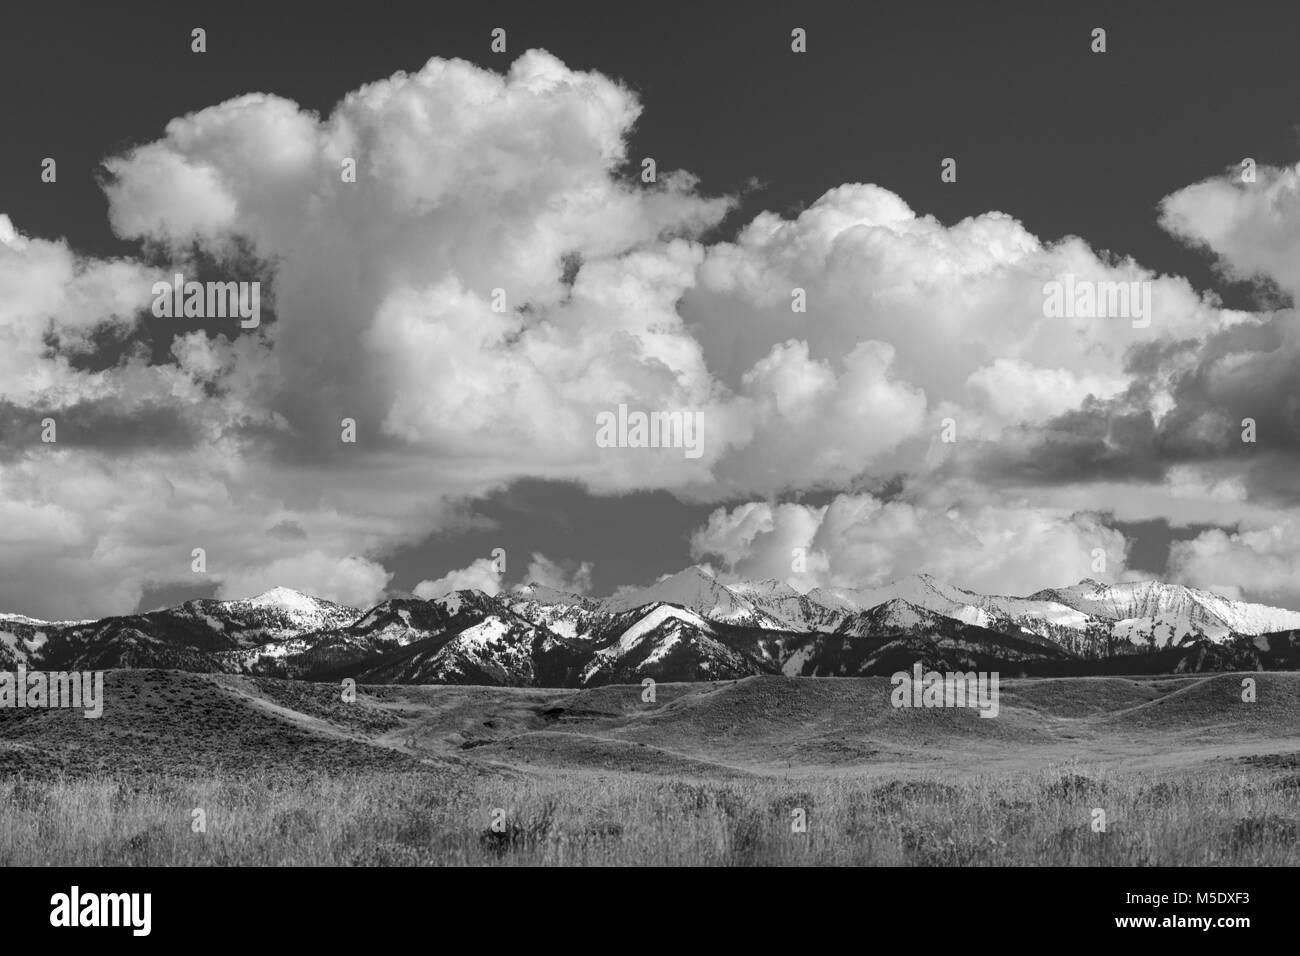 Nordamerika, USA, Rocky Mountains, Rocky Mountains, Montana, verrückt, Berge, Stockbild